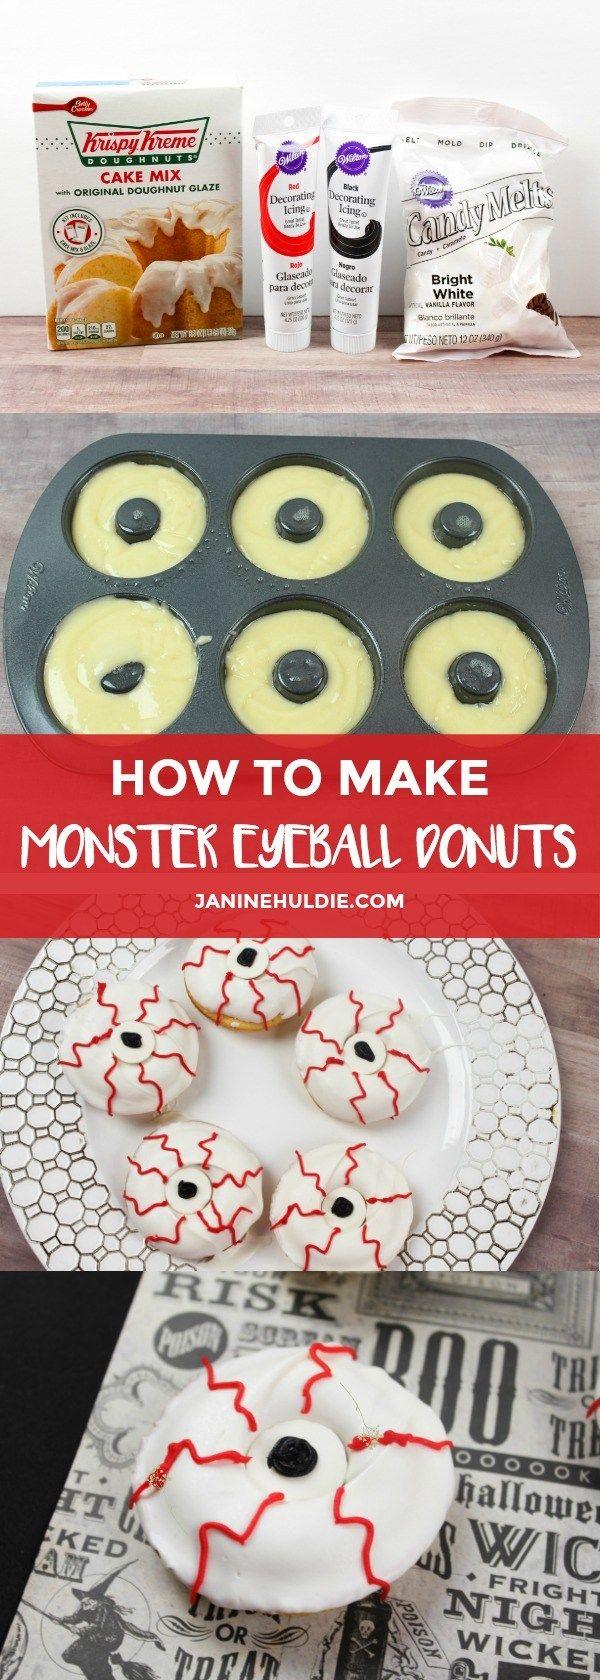 How to Make Monster Eyeball Cupcakes